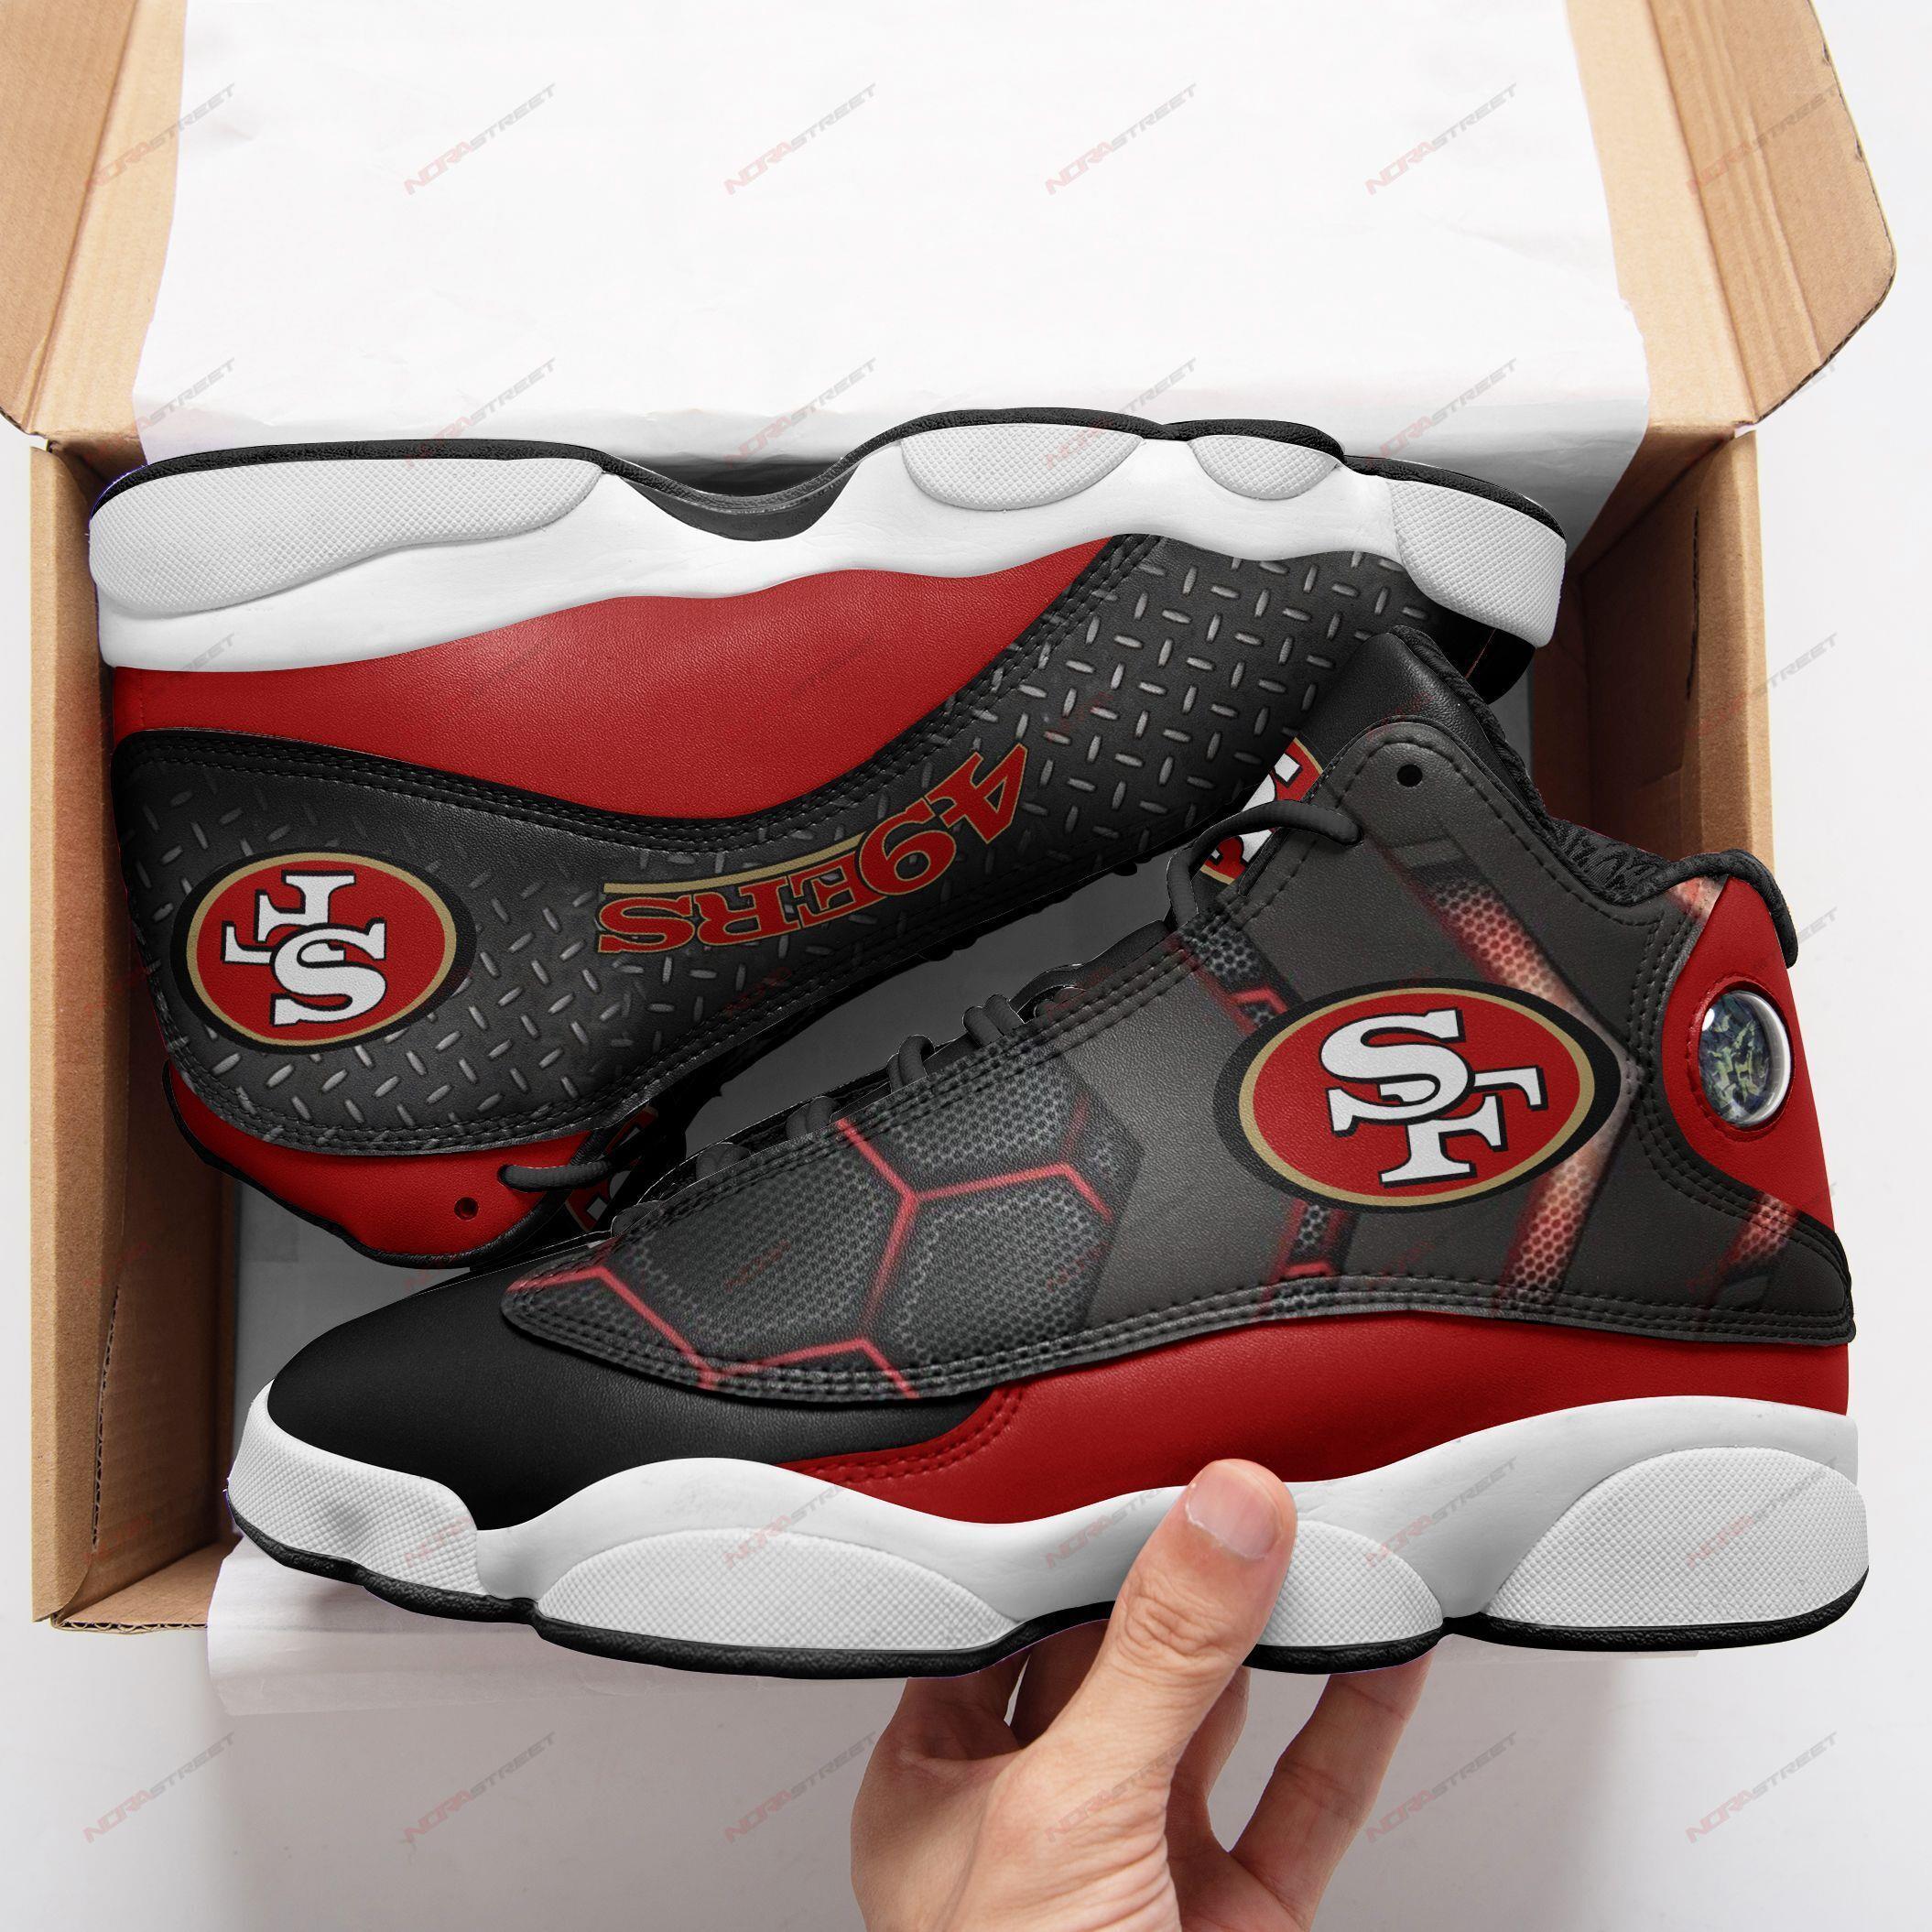 San Francisco 49ers Air Jordan 13 Sneakers Sport Shoes Plus Size